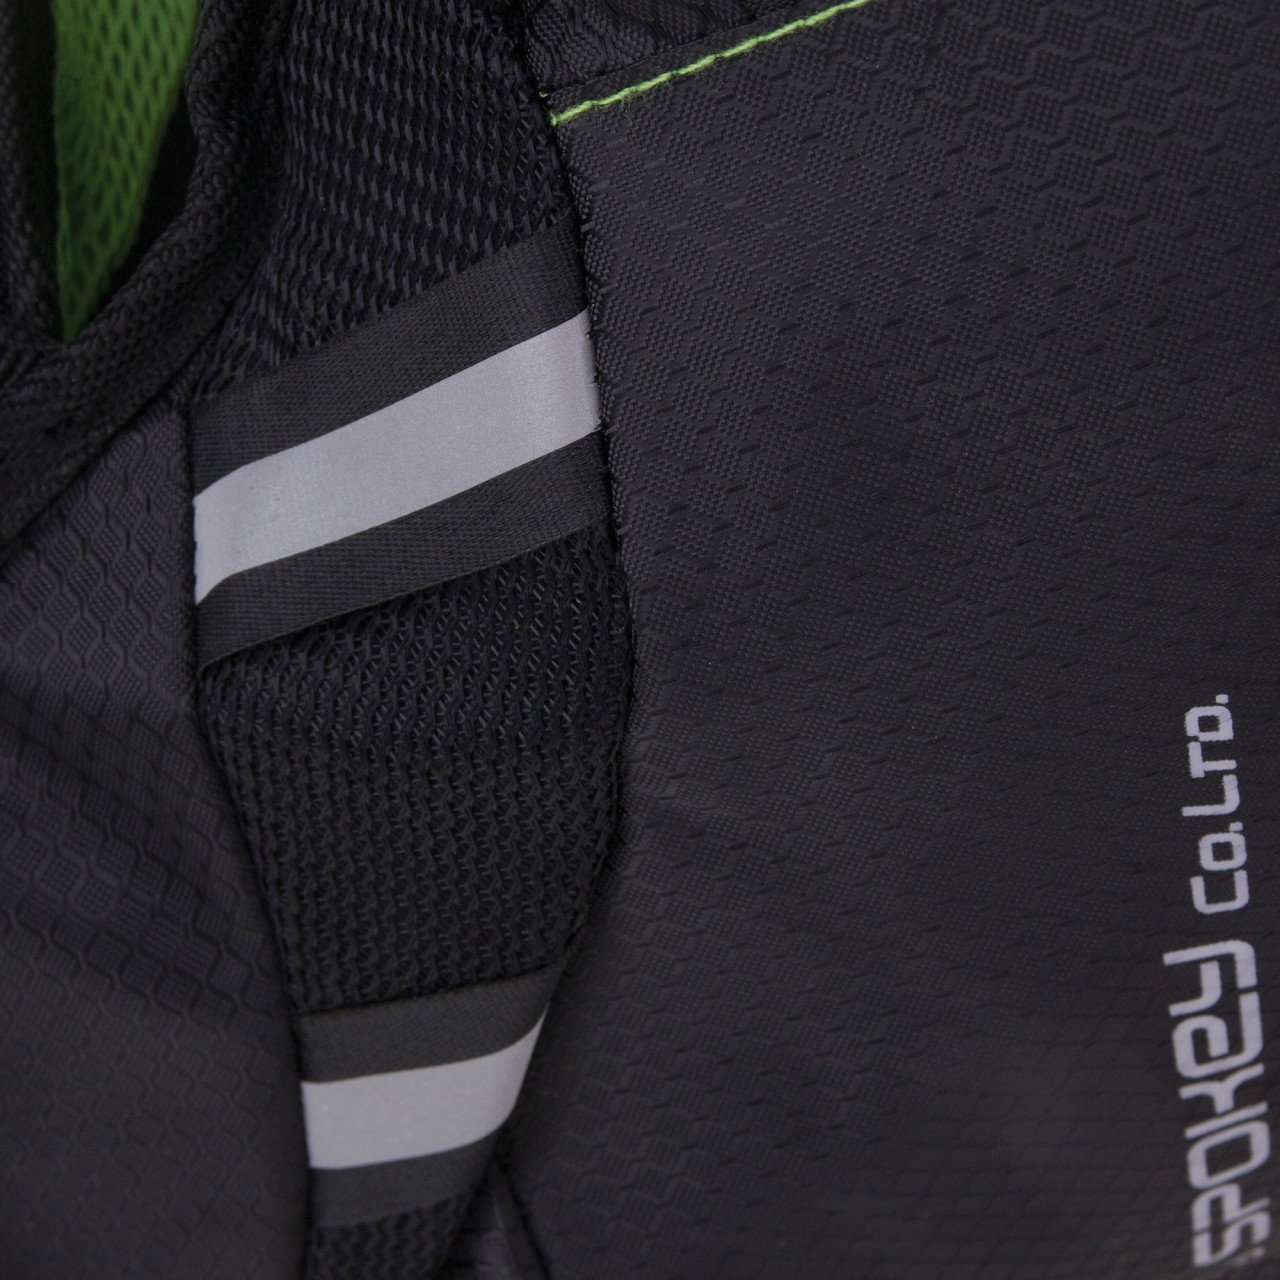 Spokey Zaino da Ciclismo Zaino Sportivo Sprinter 5 Litri Zaino con Sacca idrica